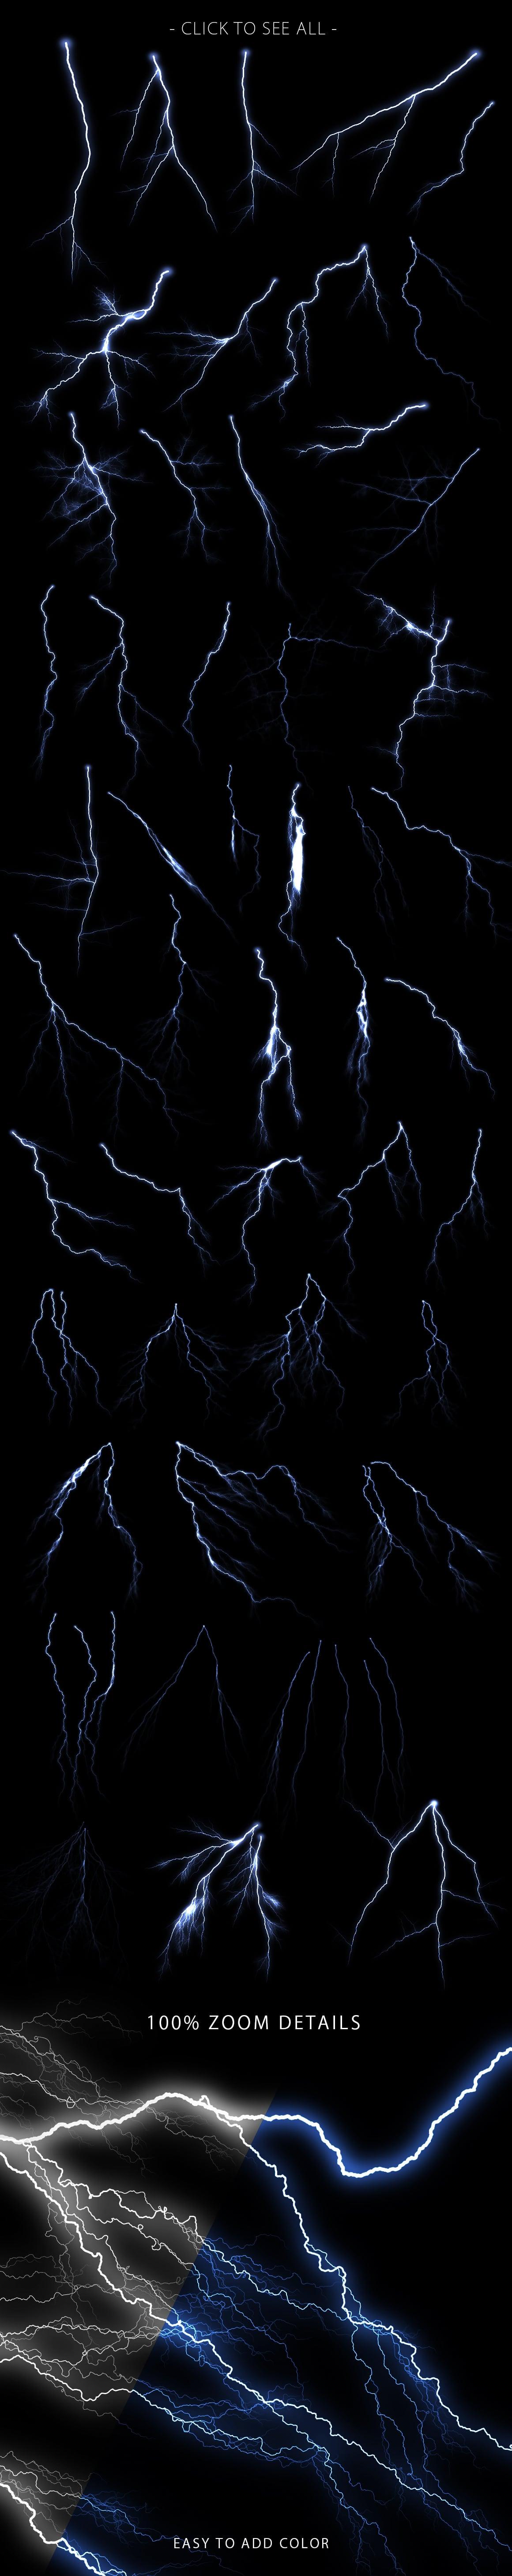 Lightning photoshop brushest prev2